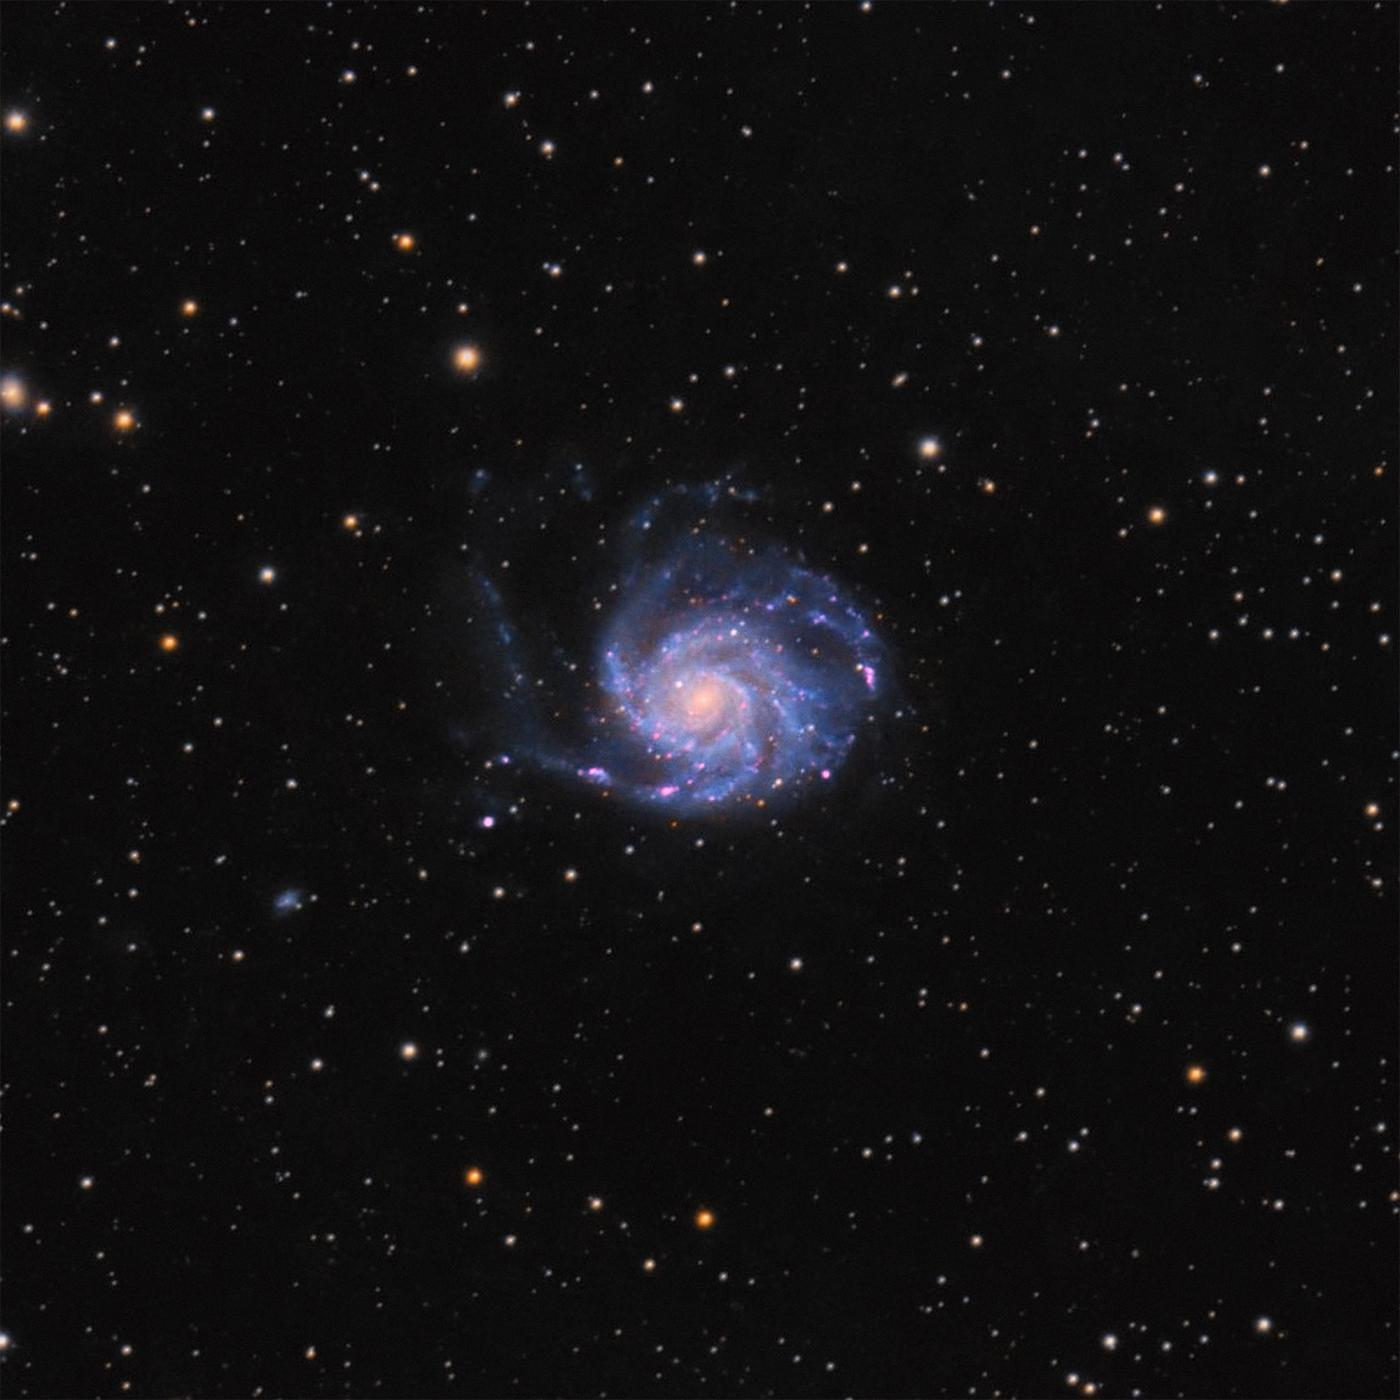 An image showing 'M101 —The Pinwheel Galaxy'